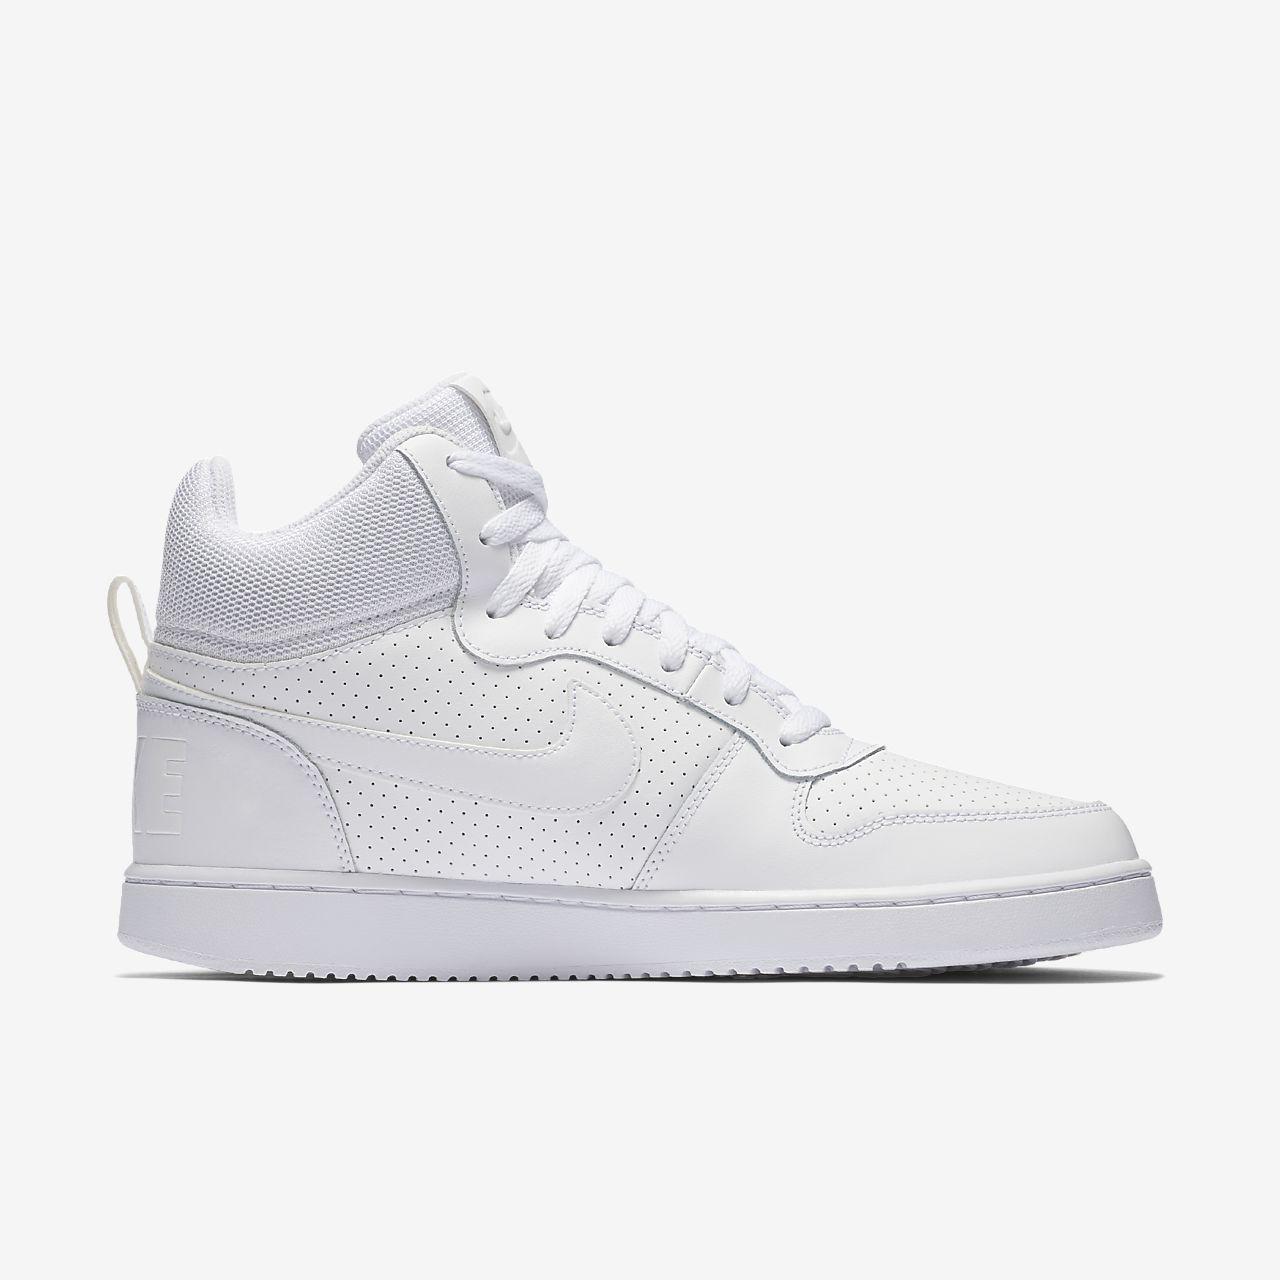 Casual Borough Court Para Hombre Zapatos Nike Negros Mid Q5nqrb y7Y6gvbf